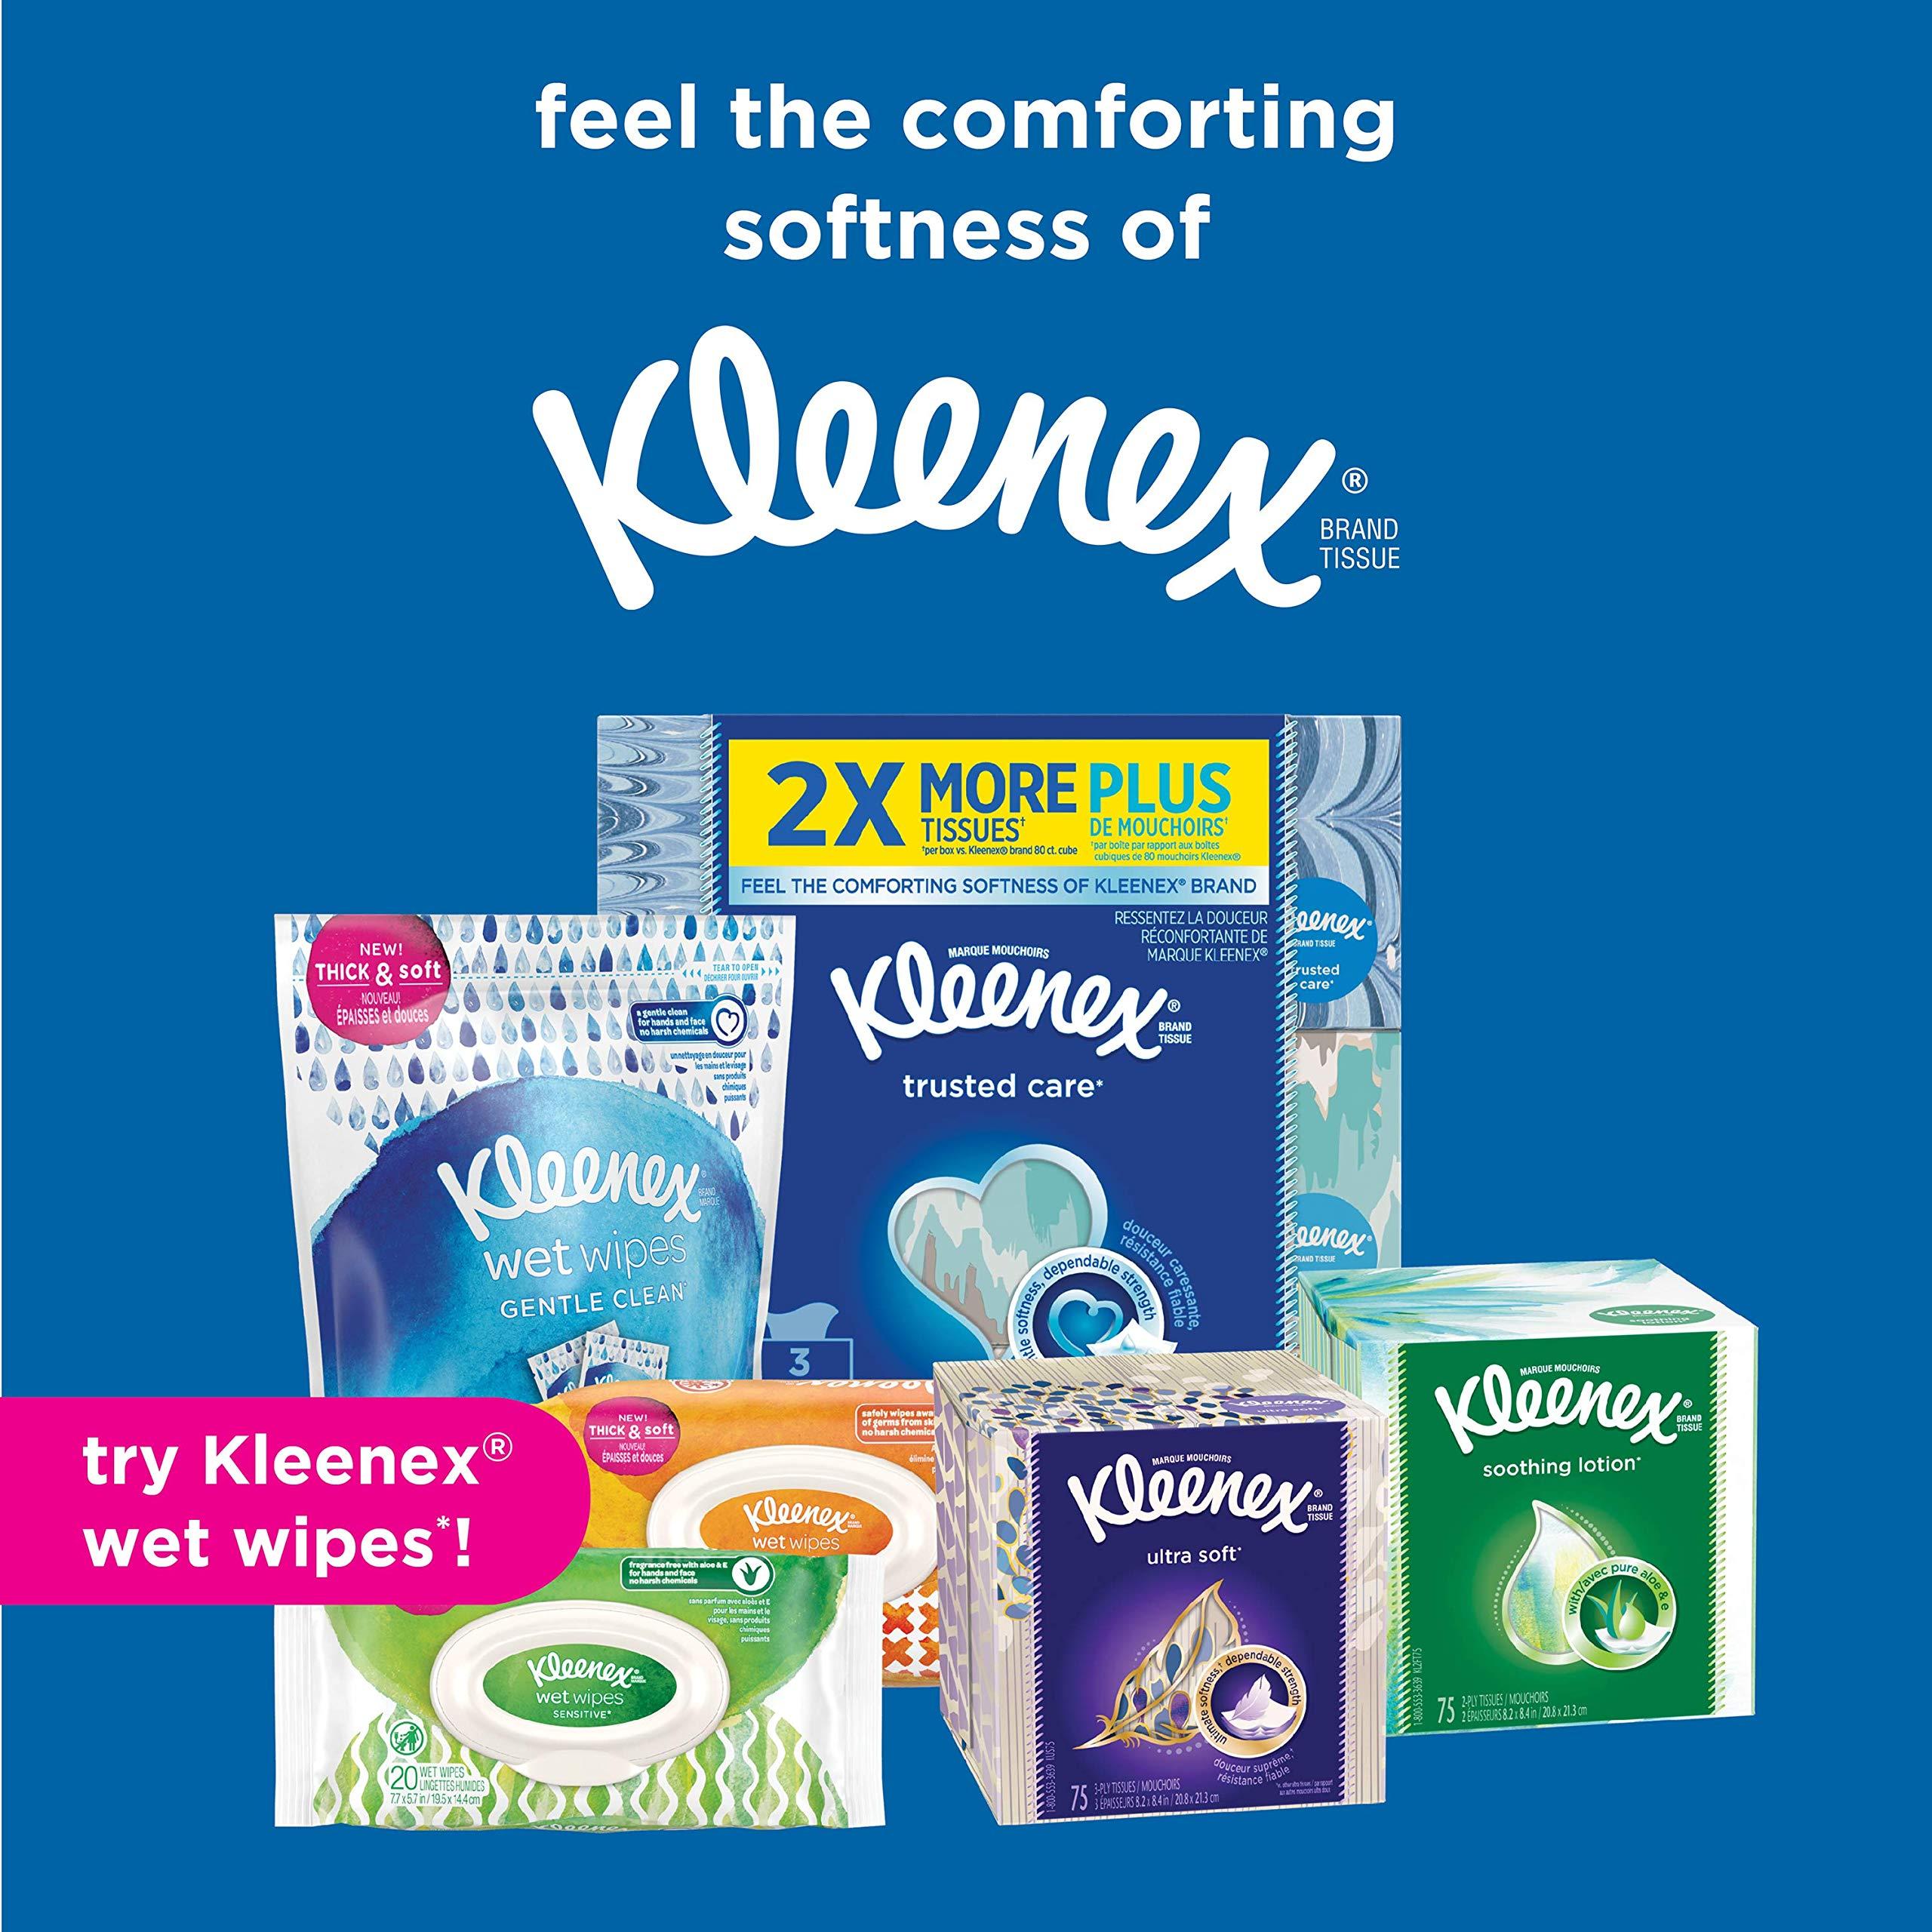 Kleenex Lotion Facial Tissues with Aloe & Vitamin E, Cube Box, 75 Tissues per Cube Box, 18 Packs by Kleenex (Image #7)